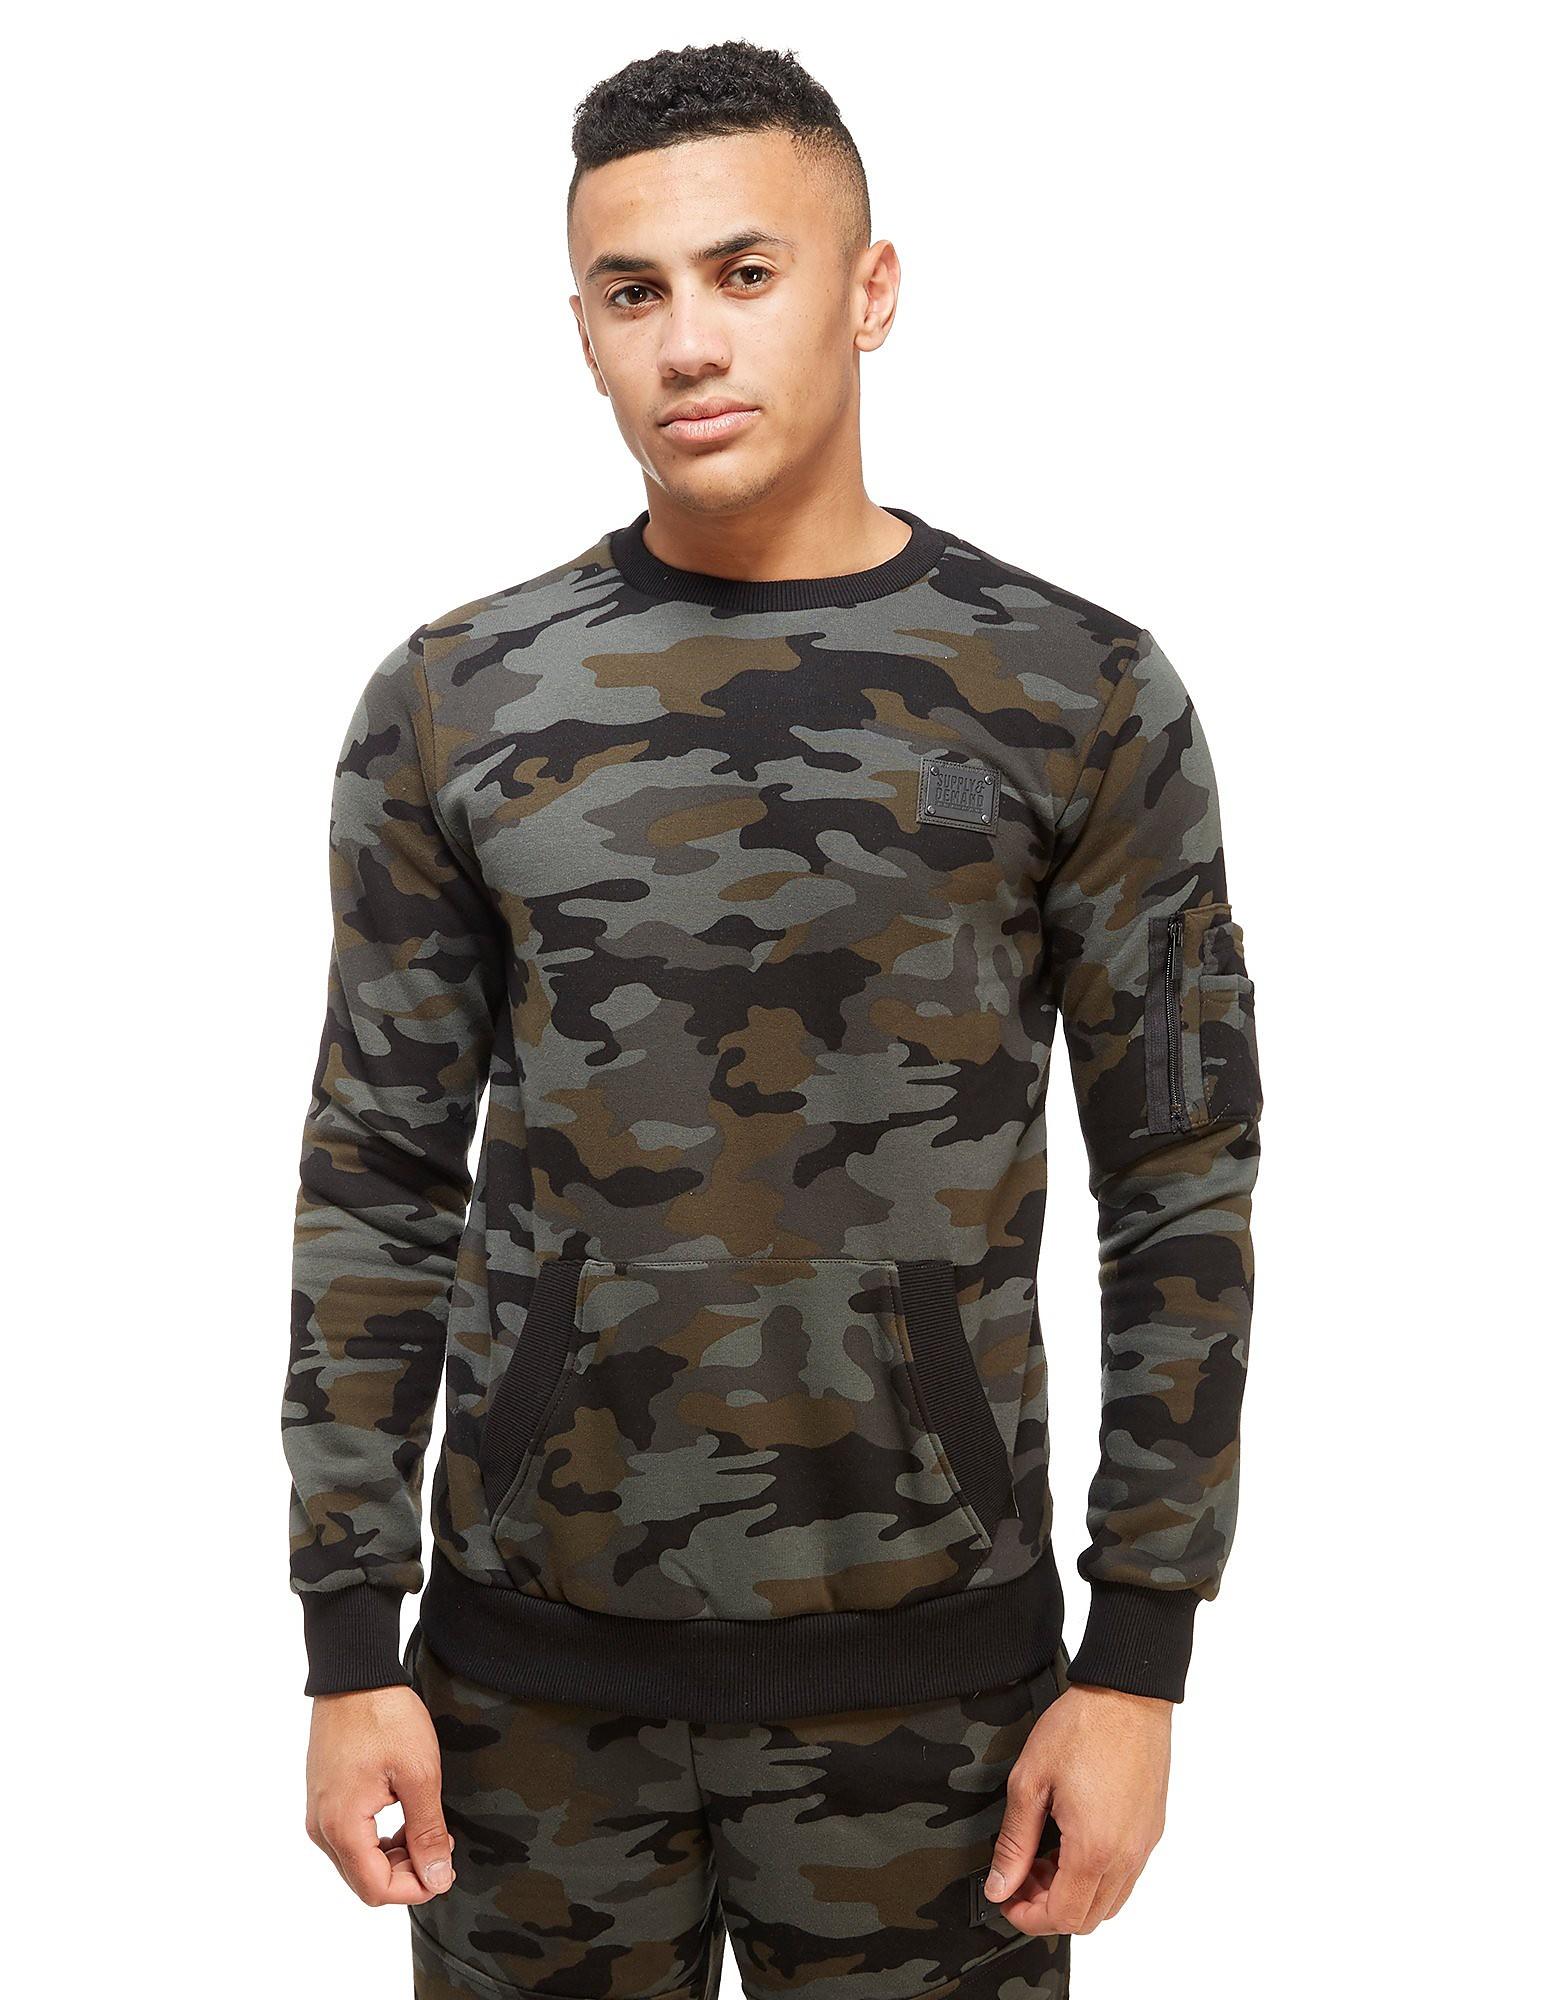 Supply & Demand Ammo Crew Sweatshirt